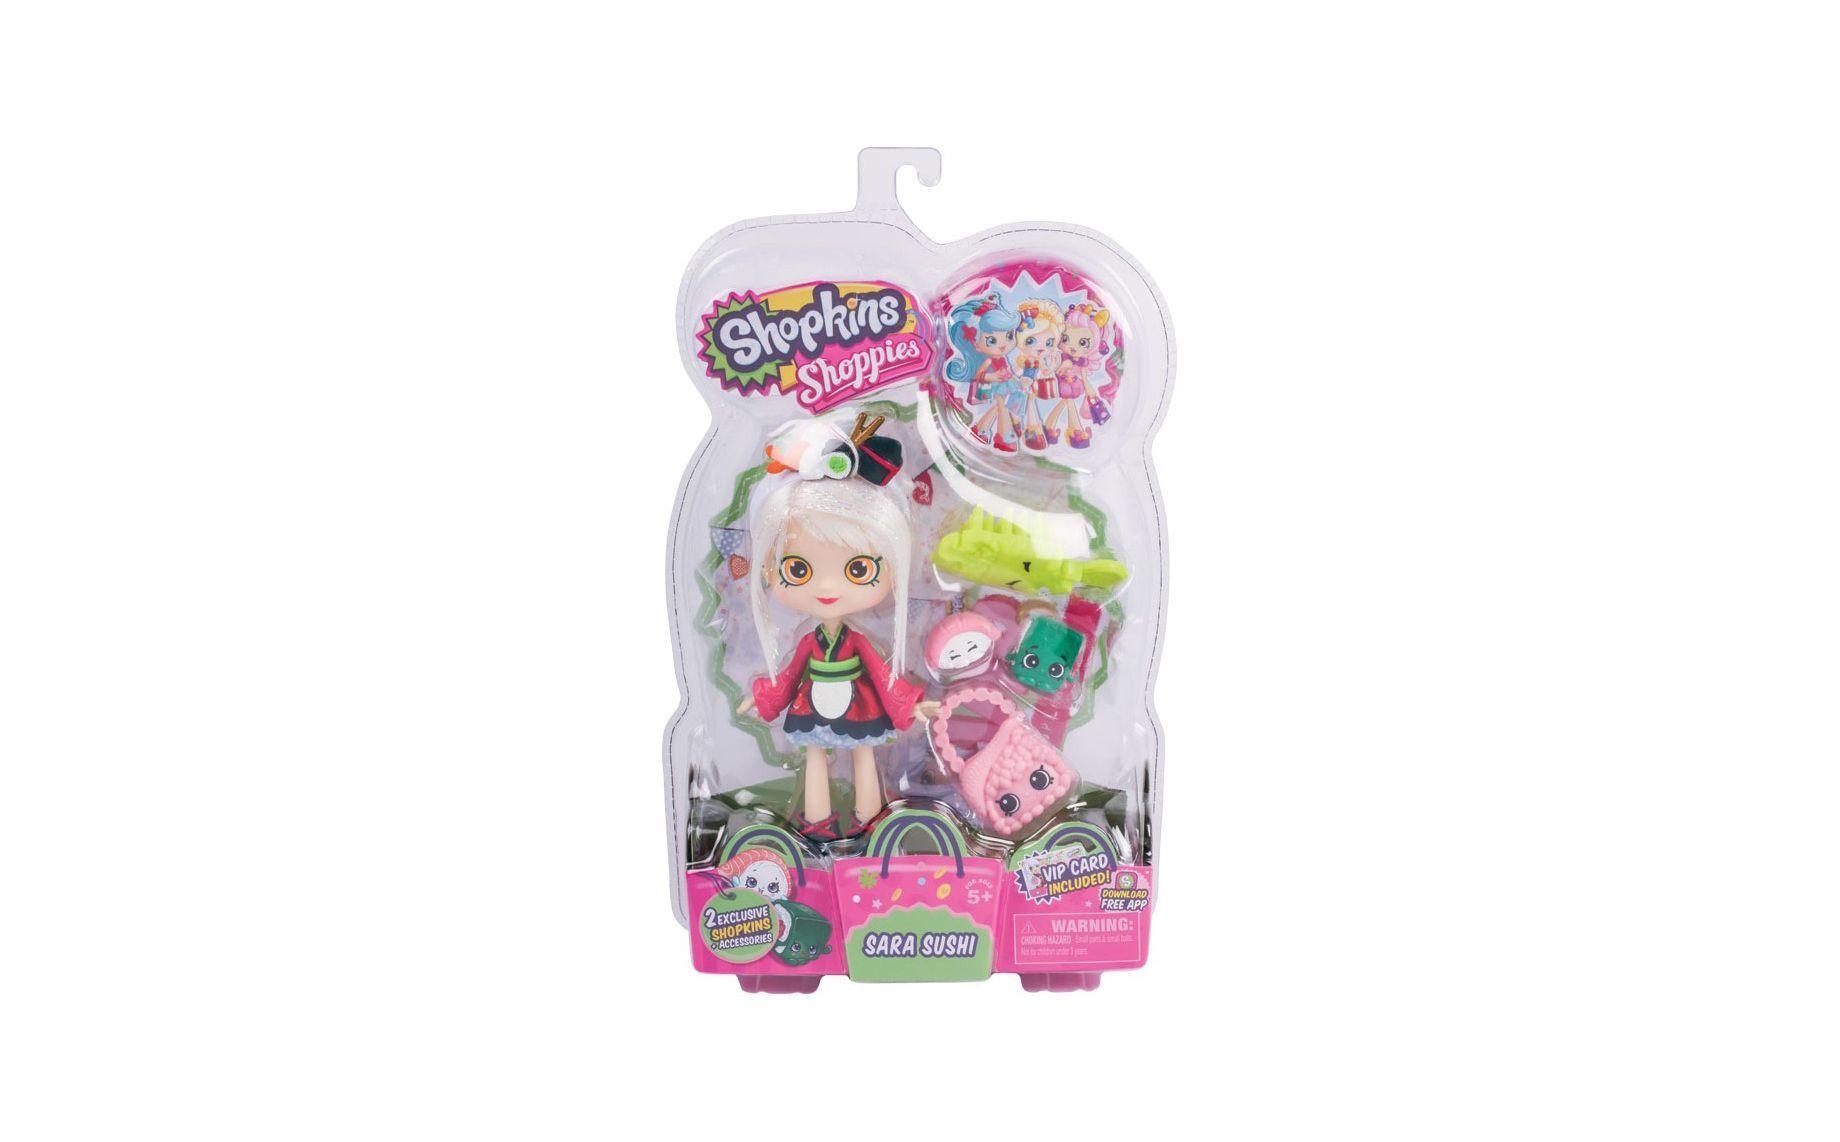 Buy Shopkins Shoppies Doll Assortment Wave 2 Series 6 Chef Club